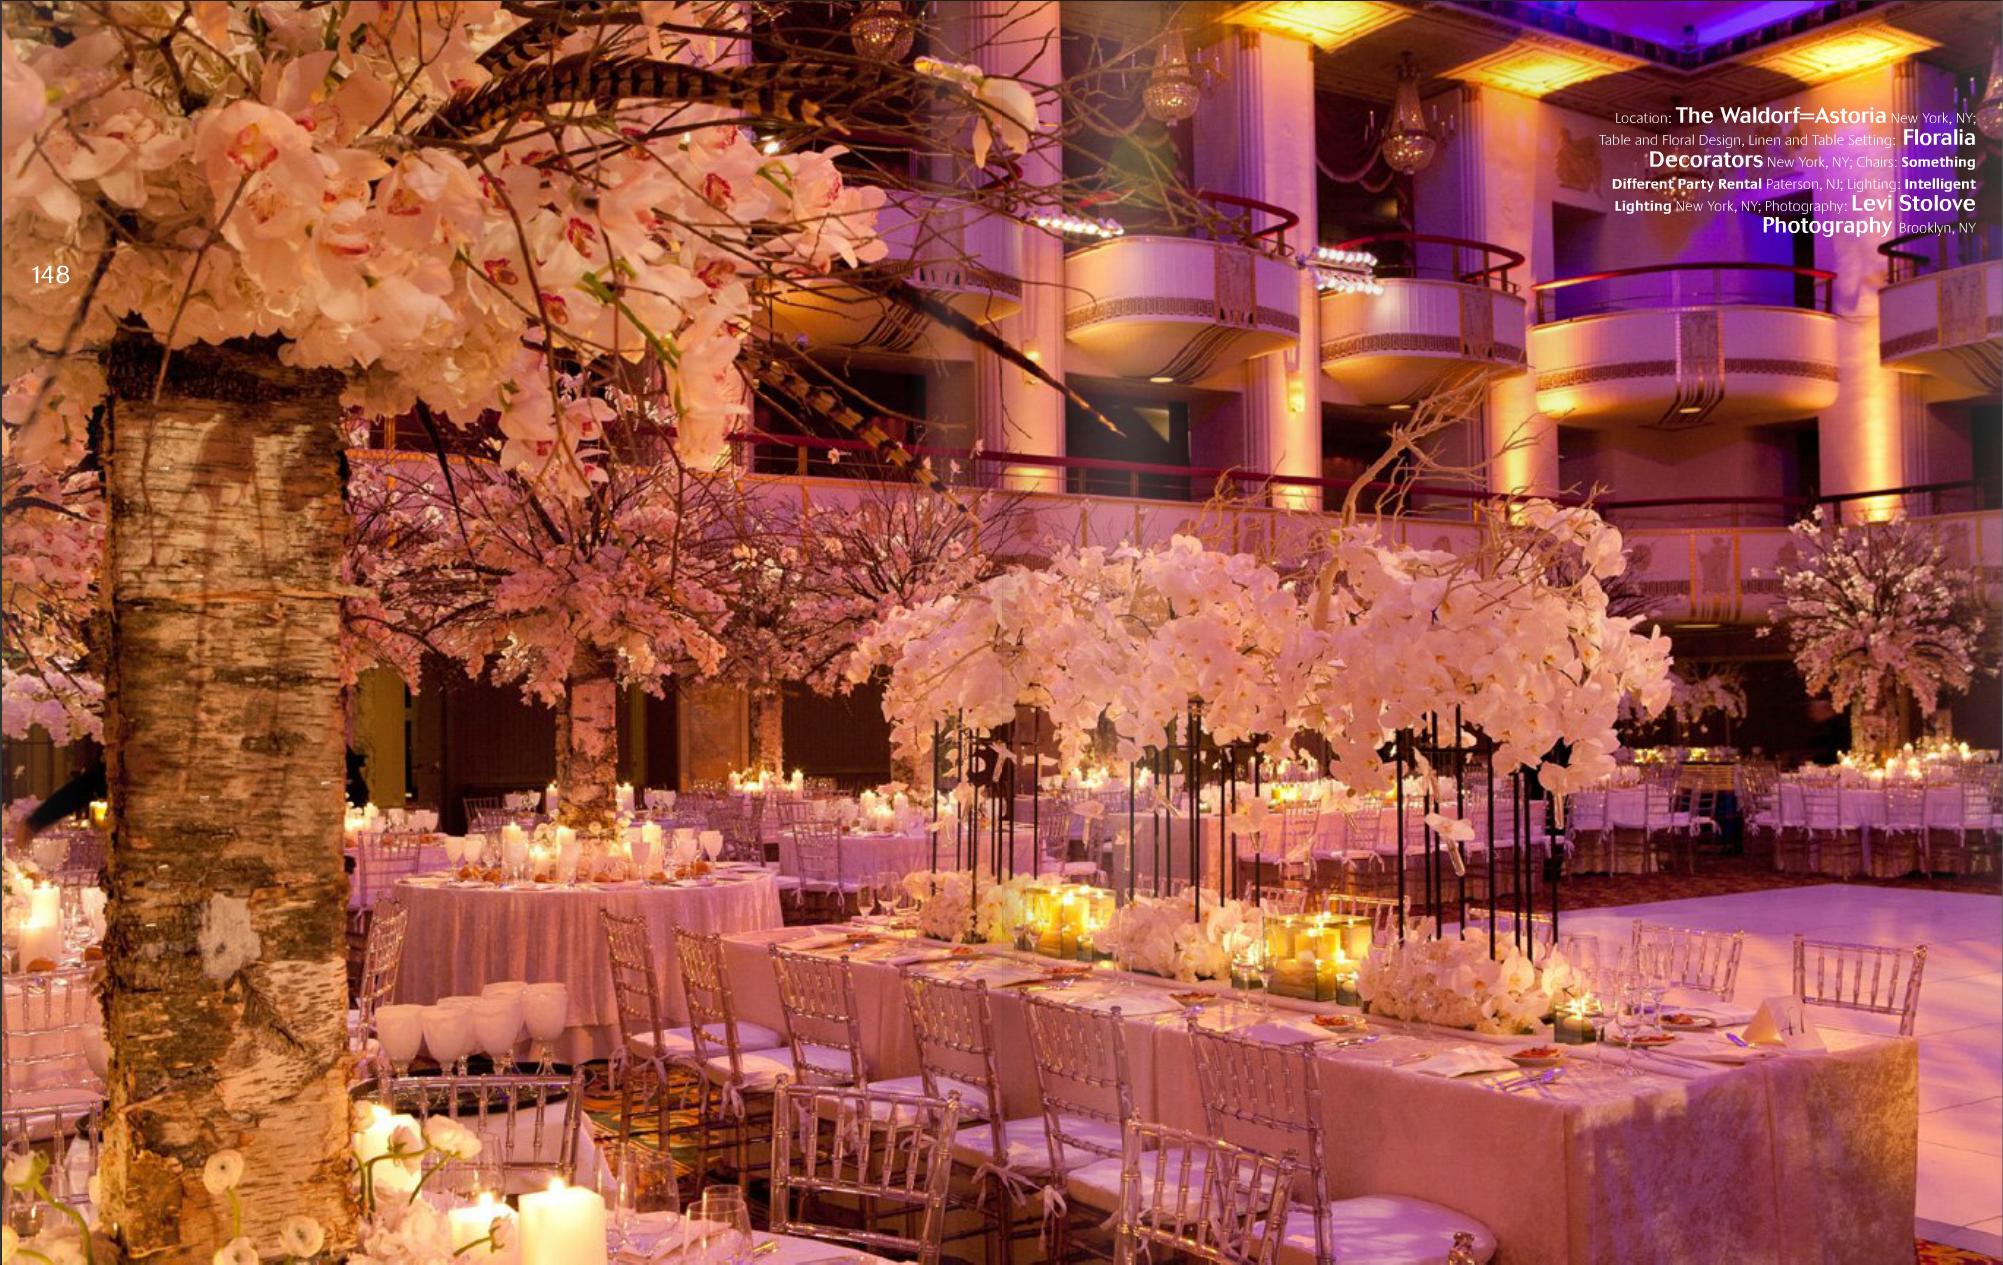 Wedding decoration png images  beautiful Waldorf Astoria wedding reception Sarah Hilton Worldwide